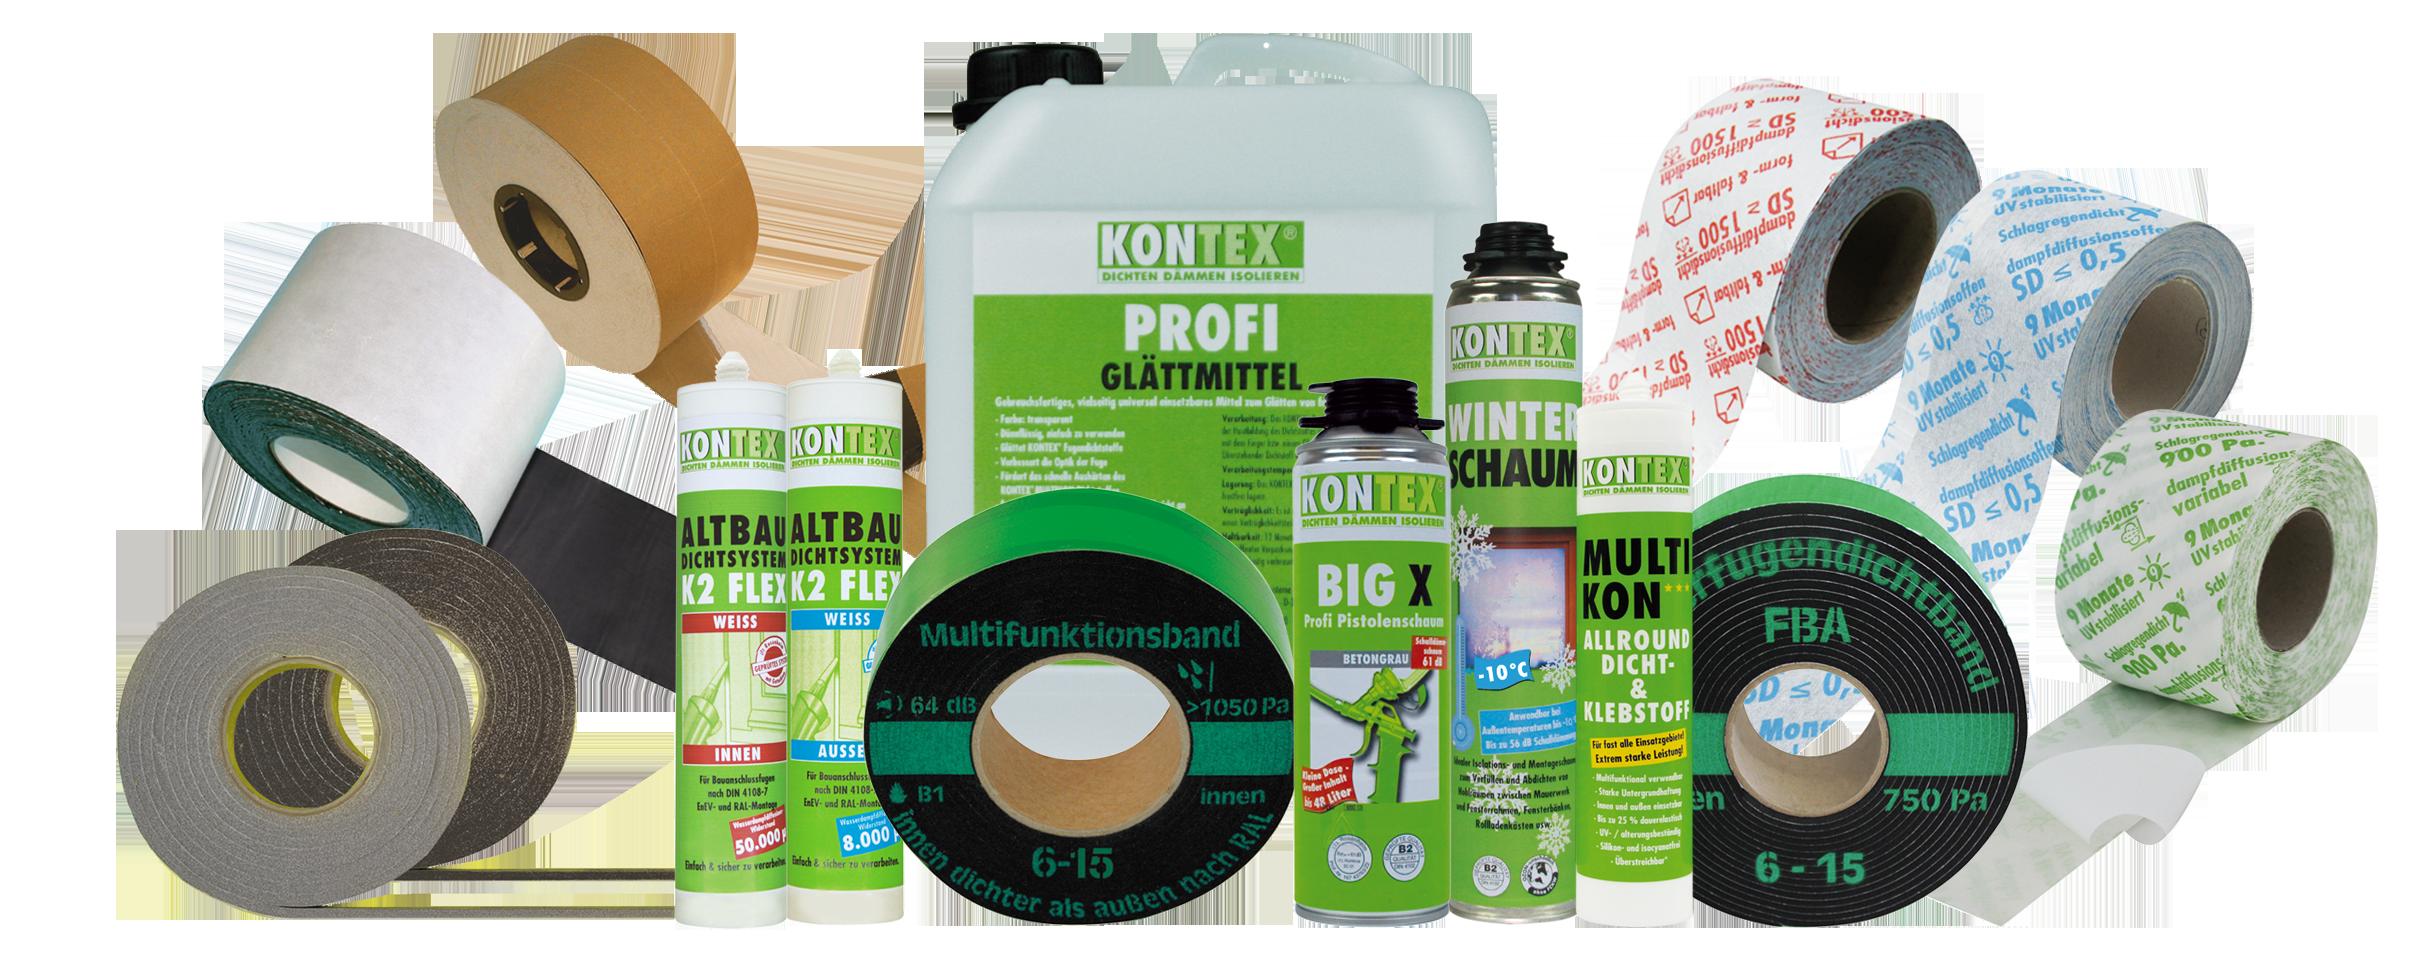 KONTEX_Produkte-Kollage_3_Internet_1